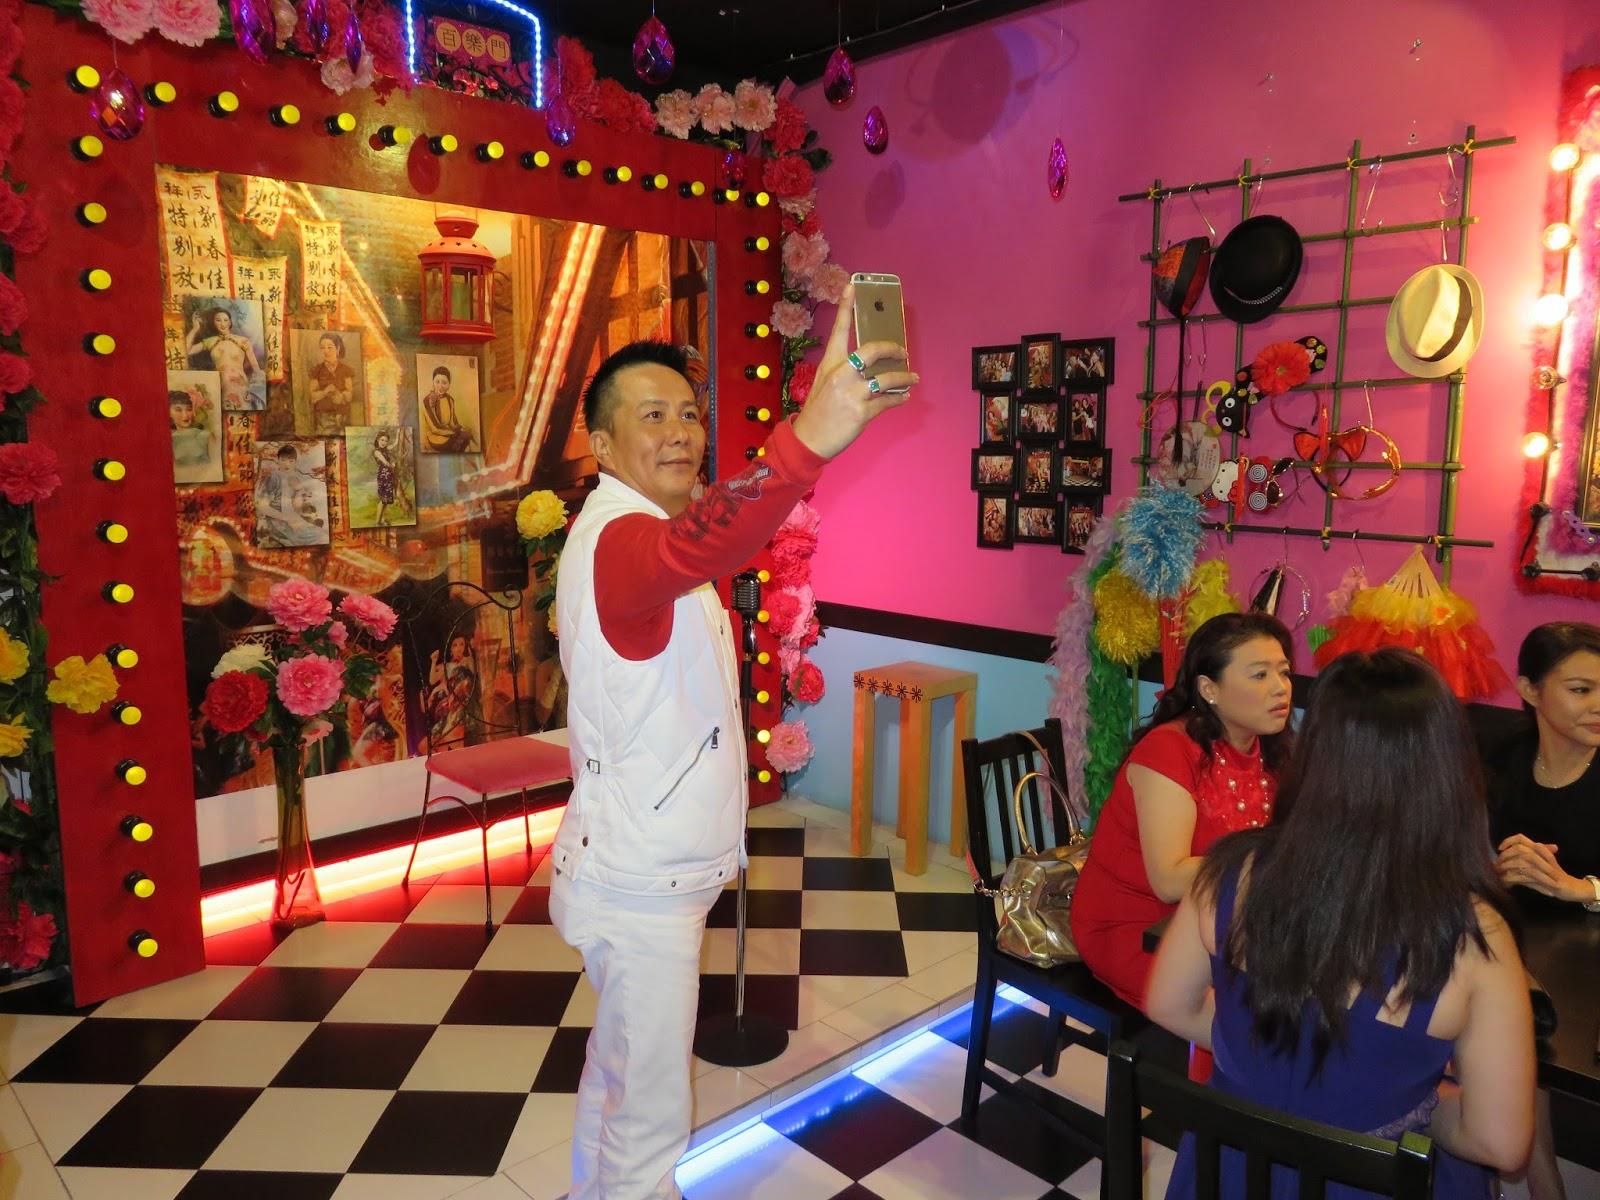 Kc S Karaoke Cafe